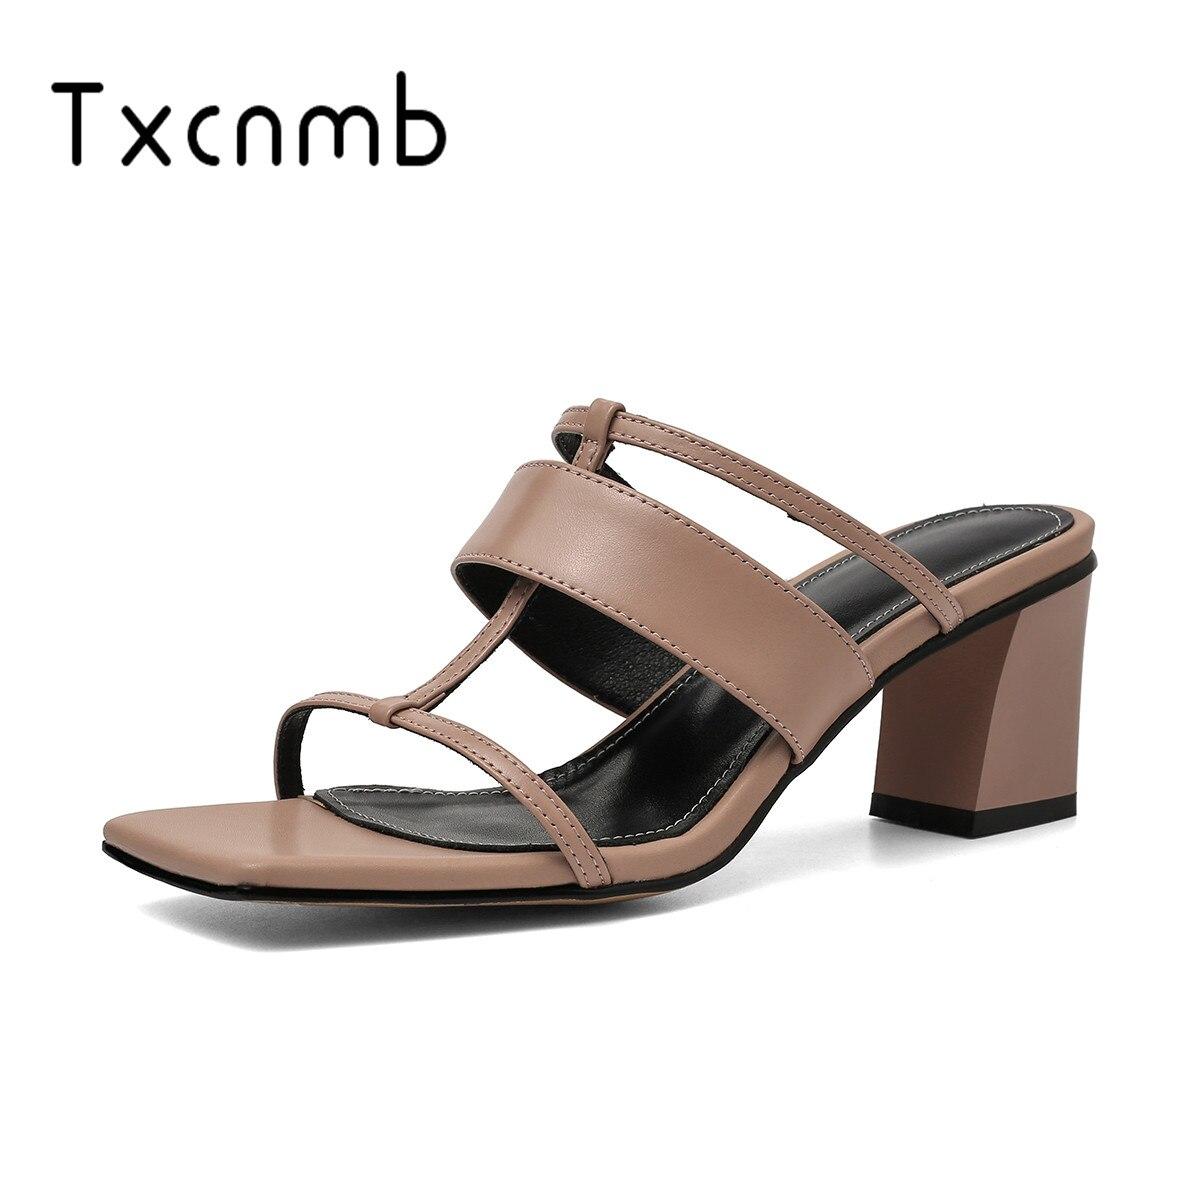 TXCNMB 2019 Sweet Genuine leather Sandals weomen High Heels Concise Basic Sandals Buckle Strap Elegant Pumps